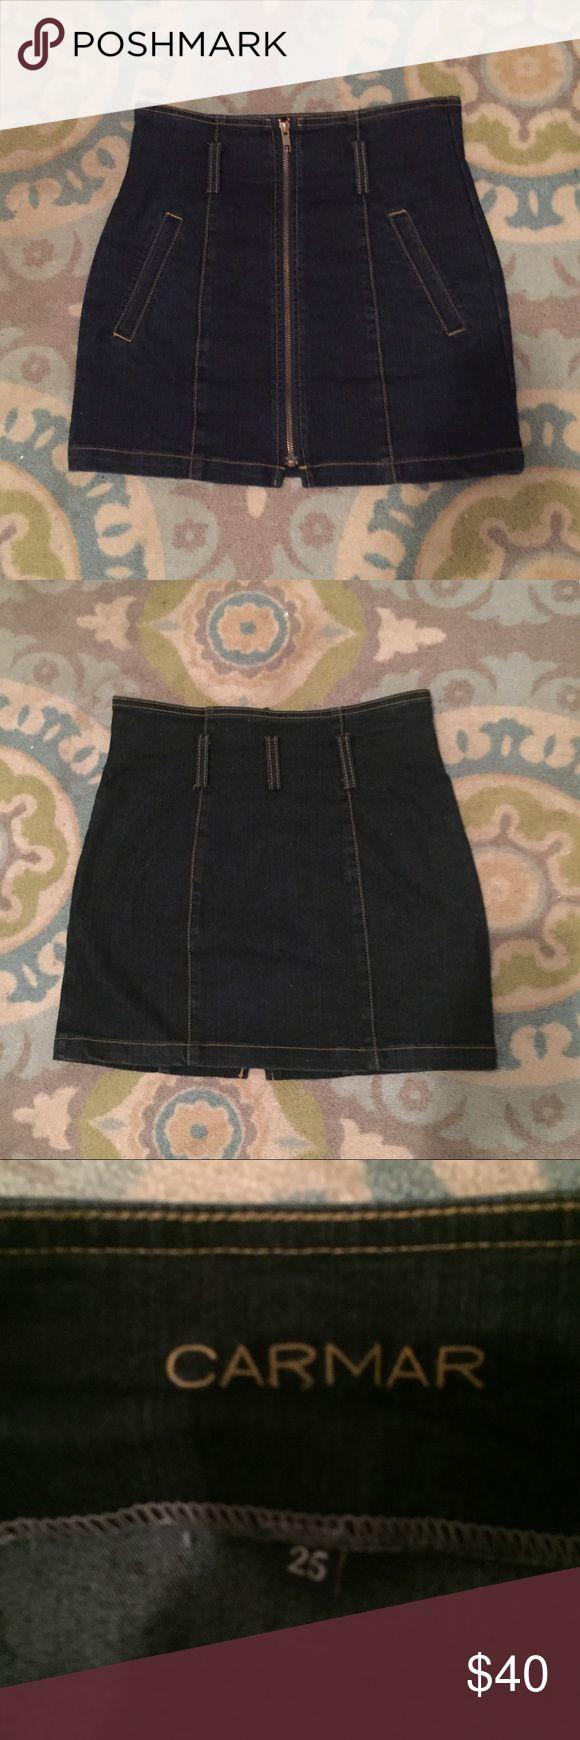 Carmar Denim zip up skirt Carmar brand zip up skirt.  So cute for spring and summer. LF Skirts Mini